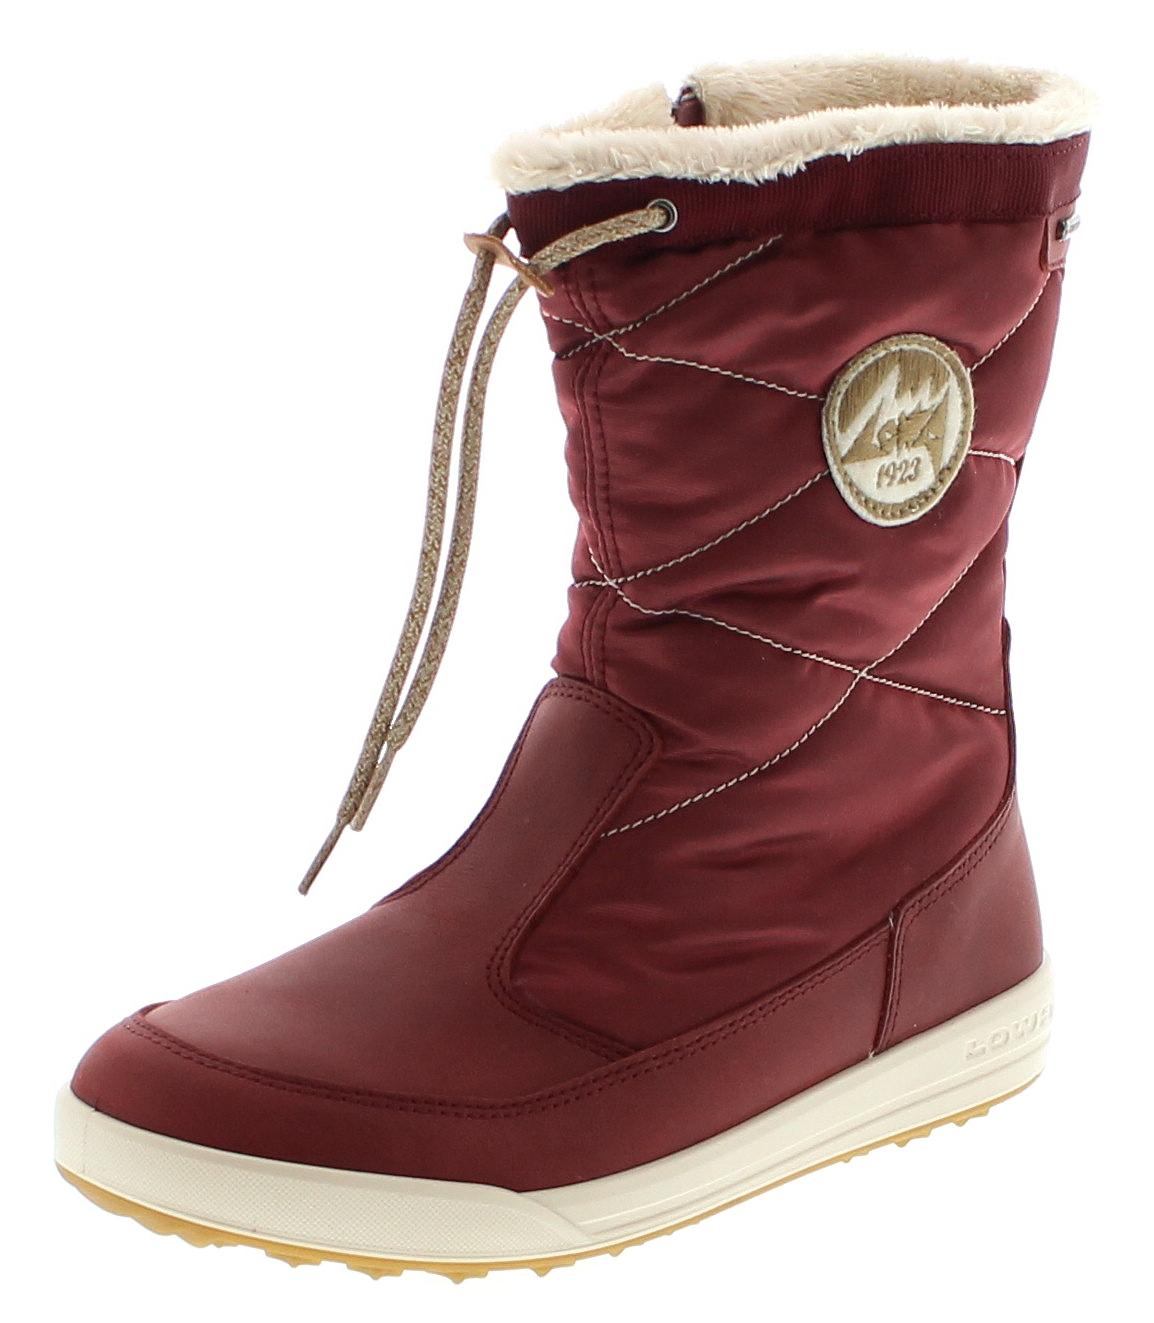 Lowa 420518-0347 VALLOIRE GTX MID WS Bordeaux Damen Hiking Schuhe - Rot